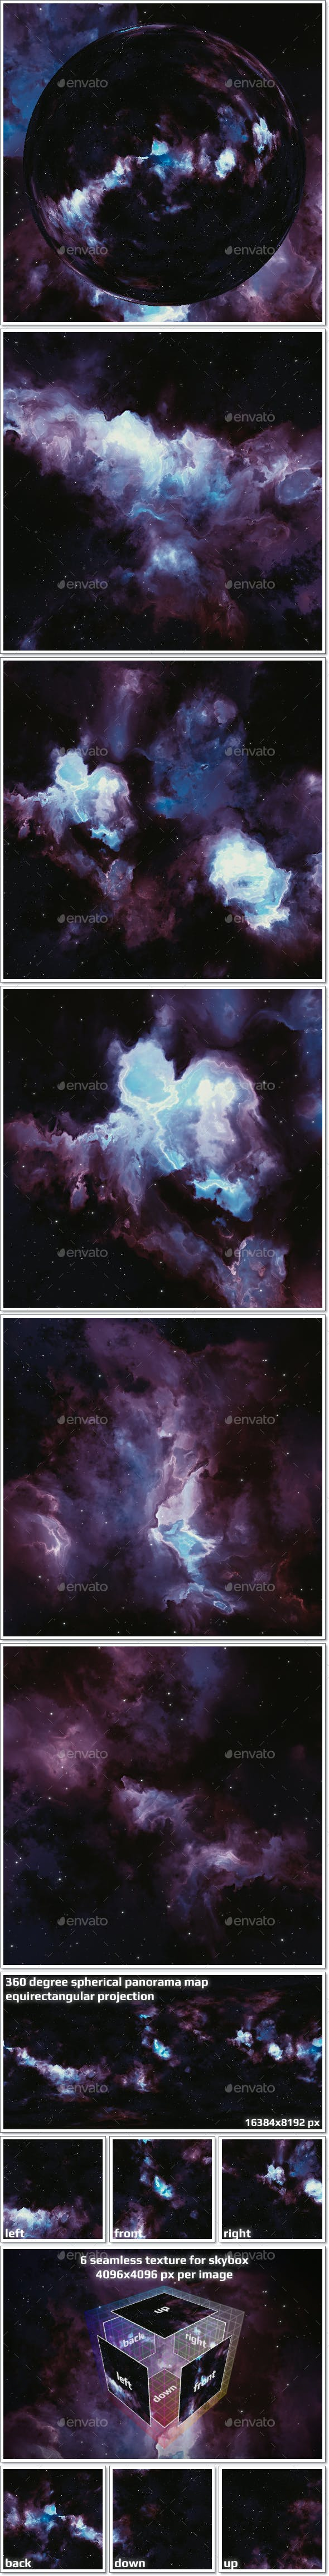 Nebula Space Environment HDRI Map 024 - 3DOcean Item for Sale